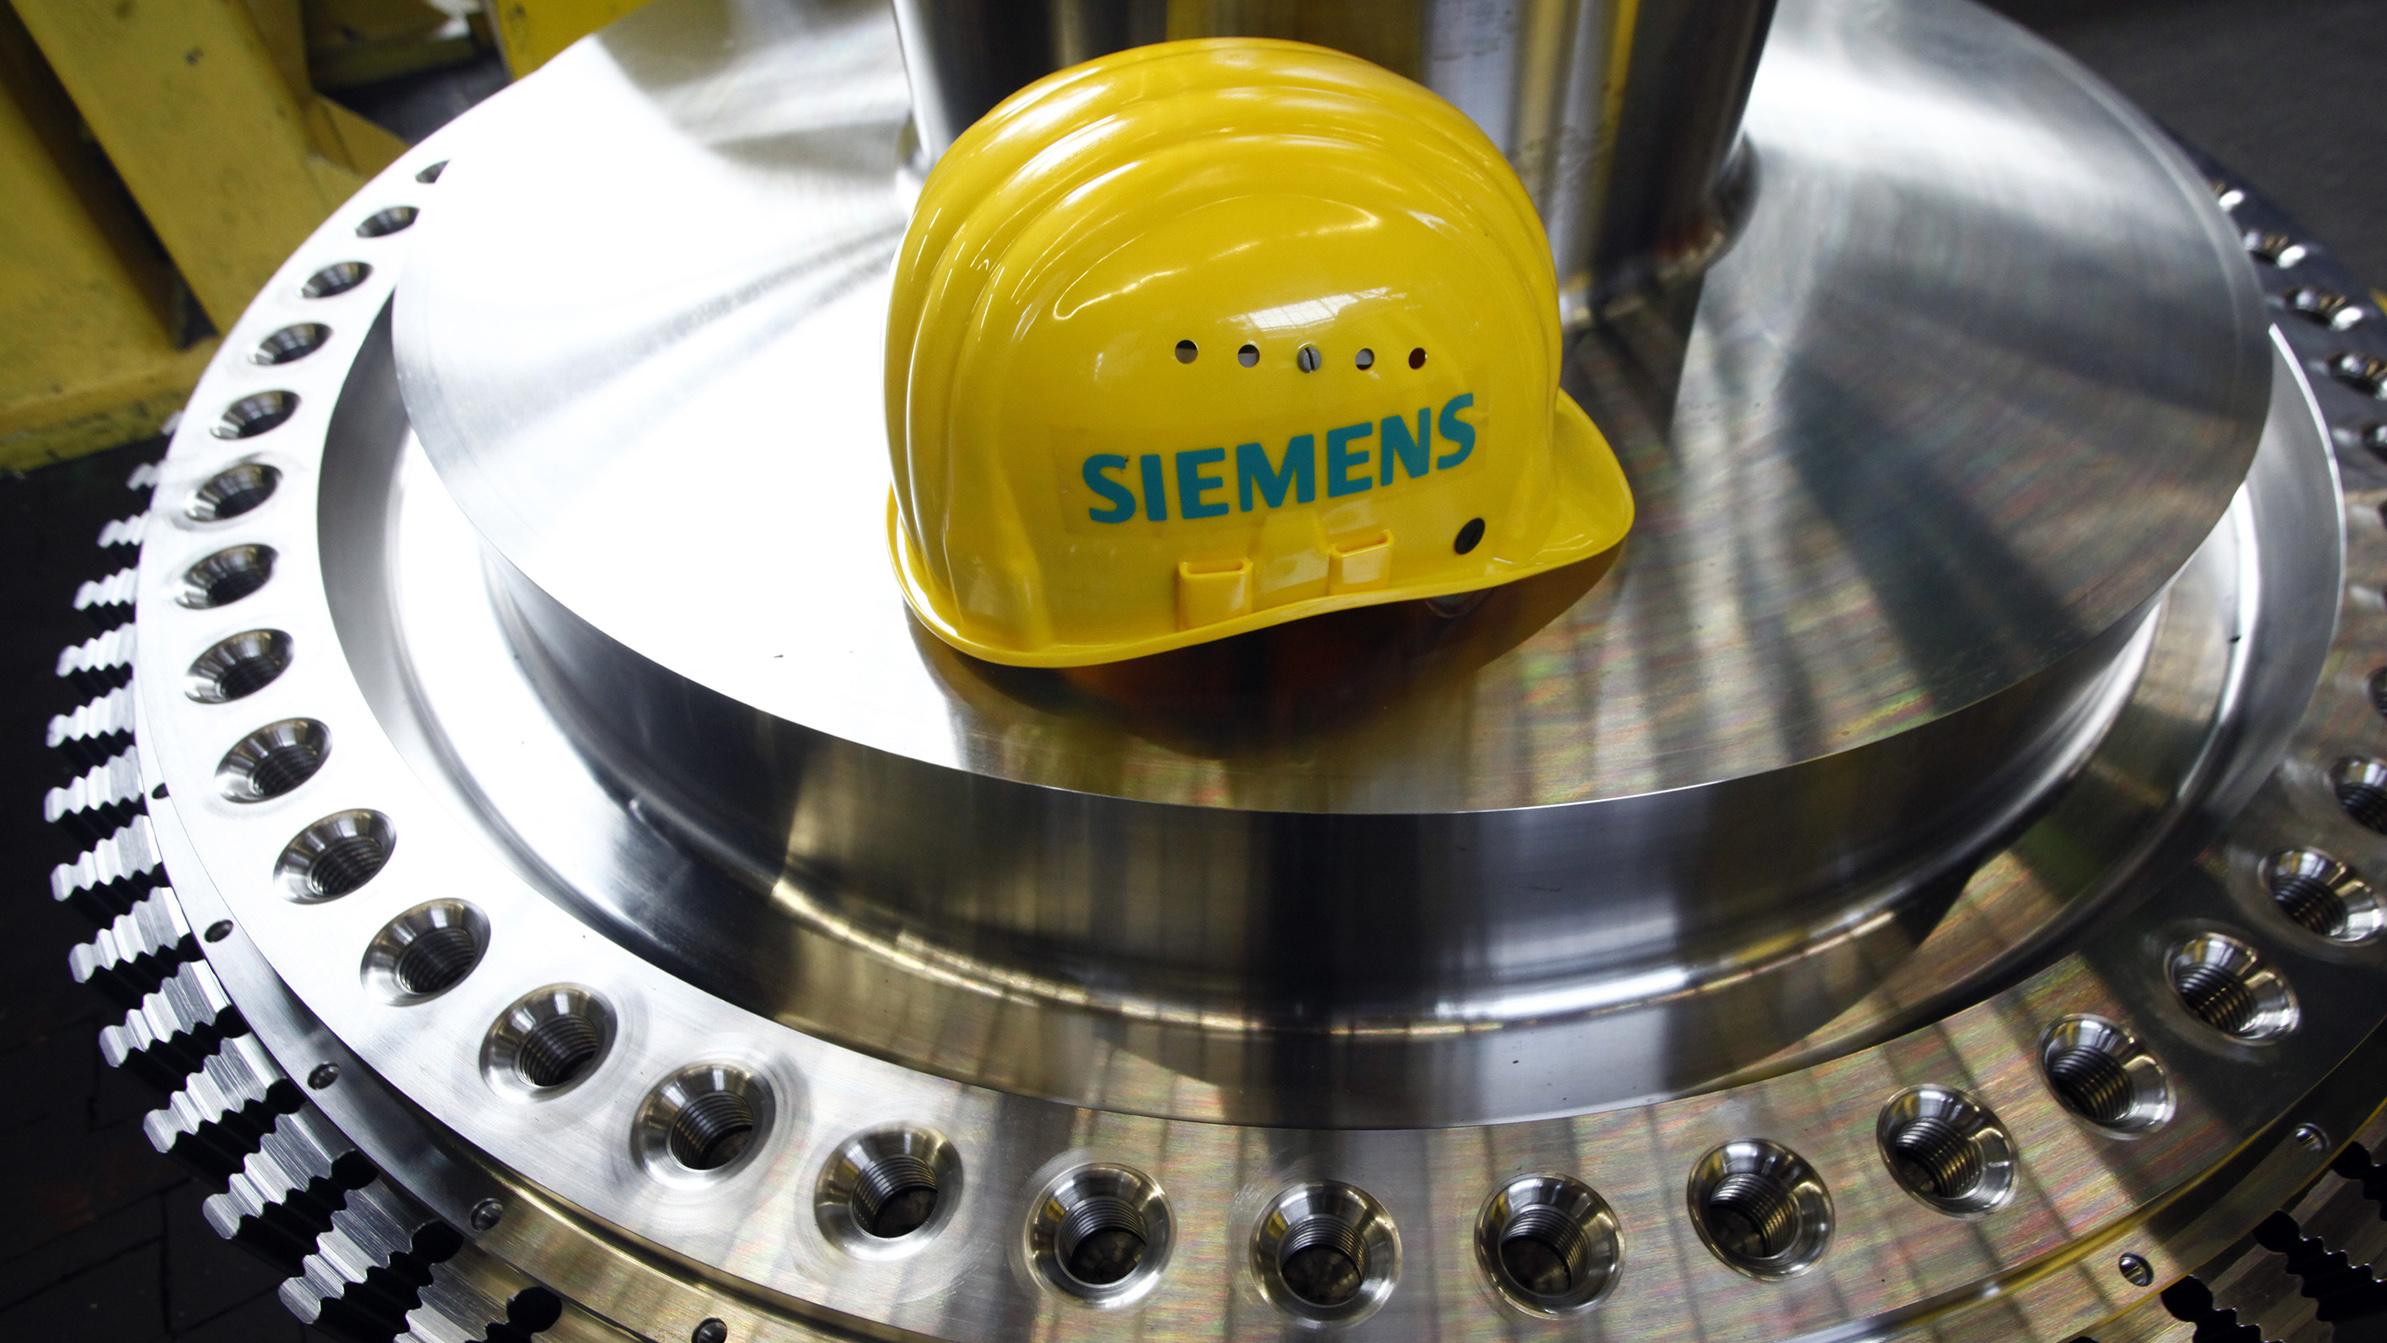 Inside Siemens Turbine Factory As German Economy Improves